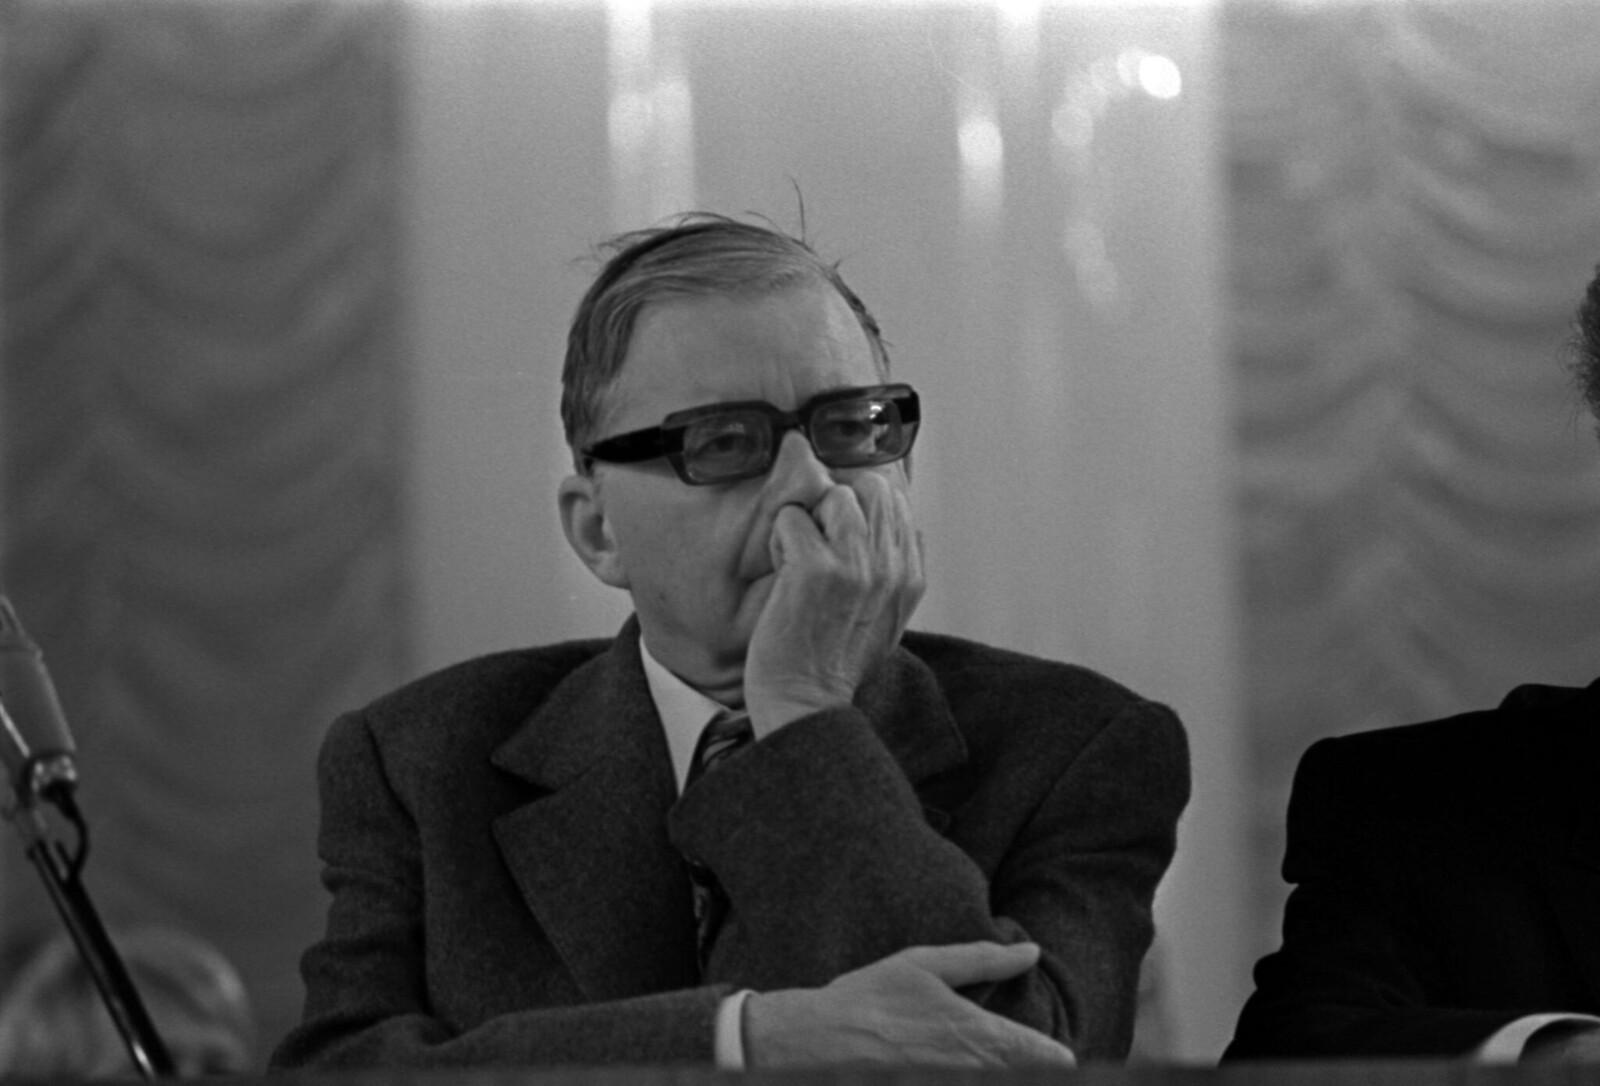 1972. Съезд Союза композиторов СССР в Колонном зале Дома Союзов Дмитрия Шостаковича